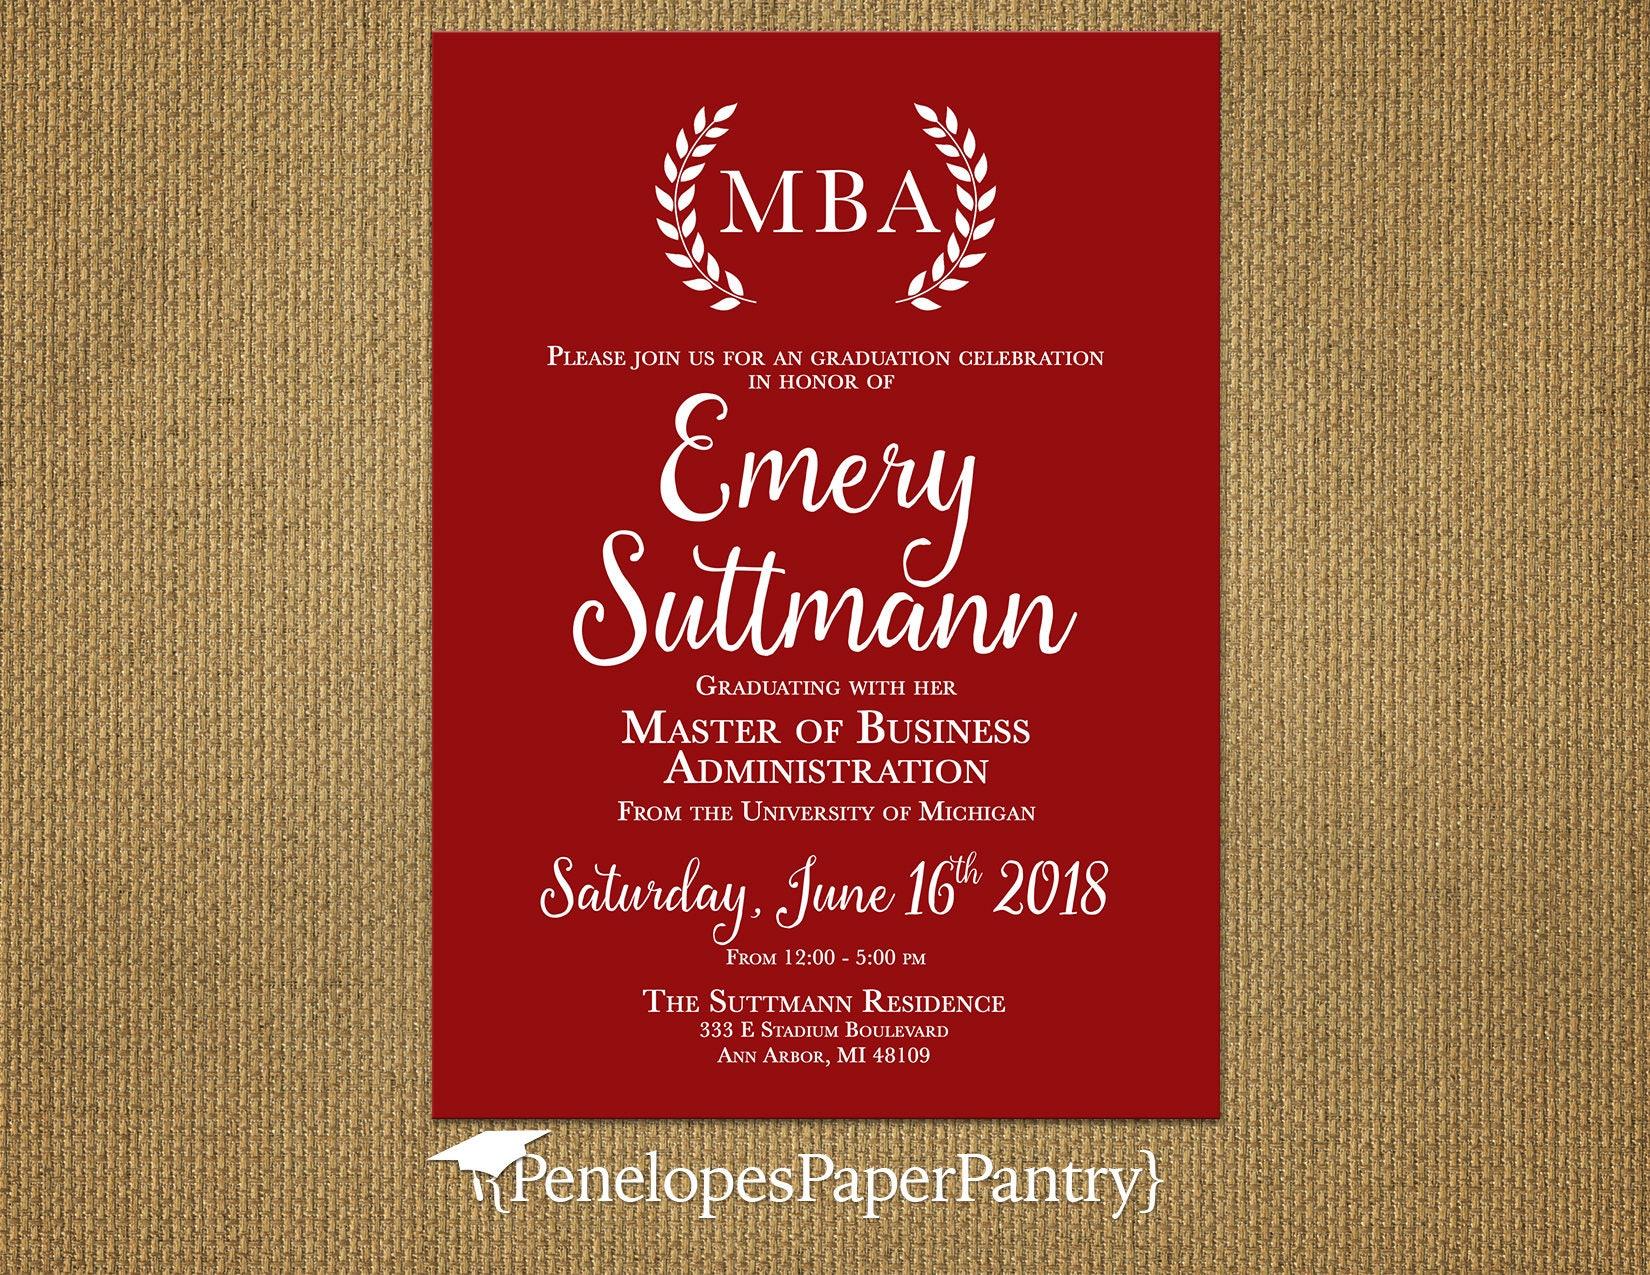 Elegant Red MBA Graduation AnnouncementParty InvitationMBA | Etsy